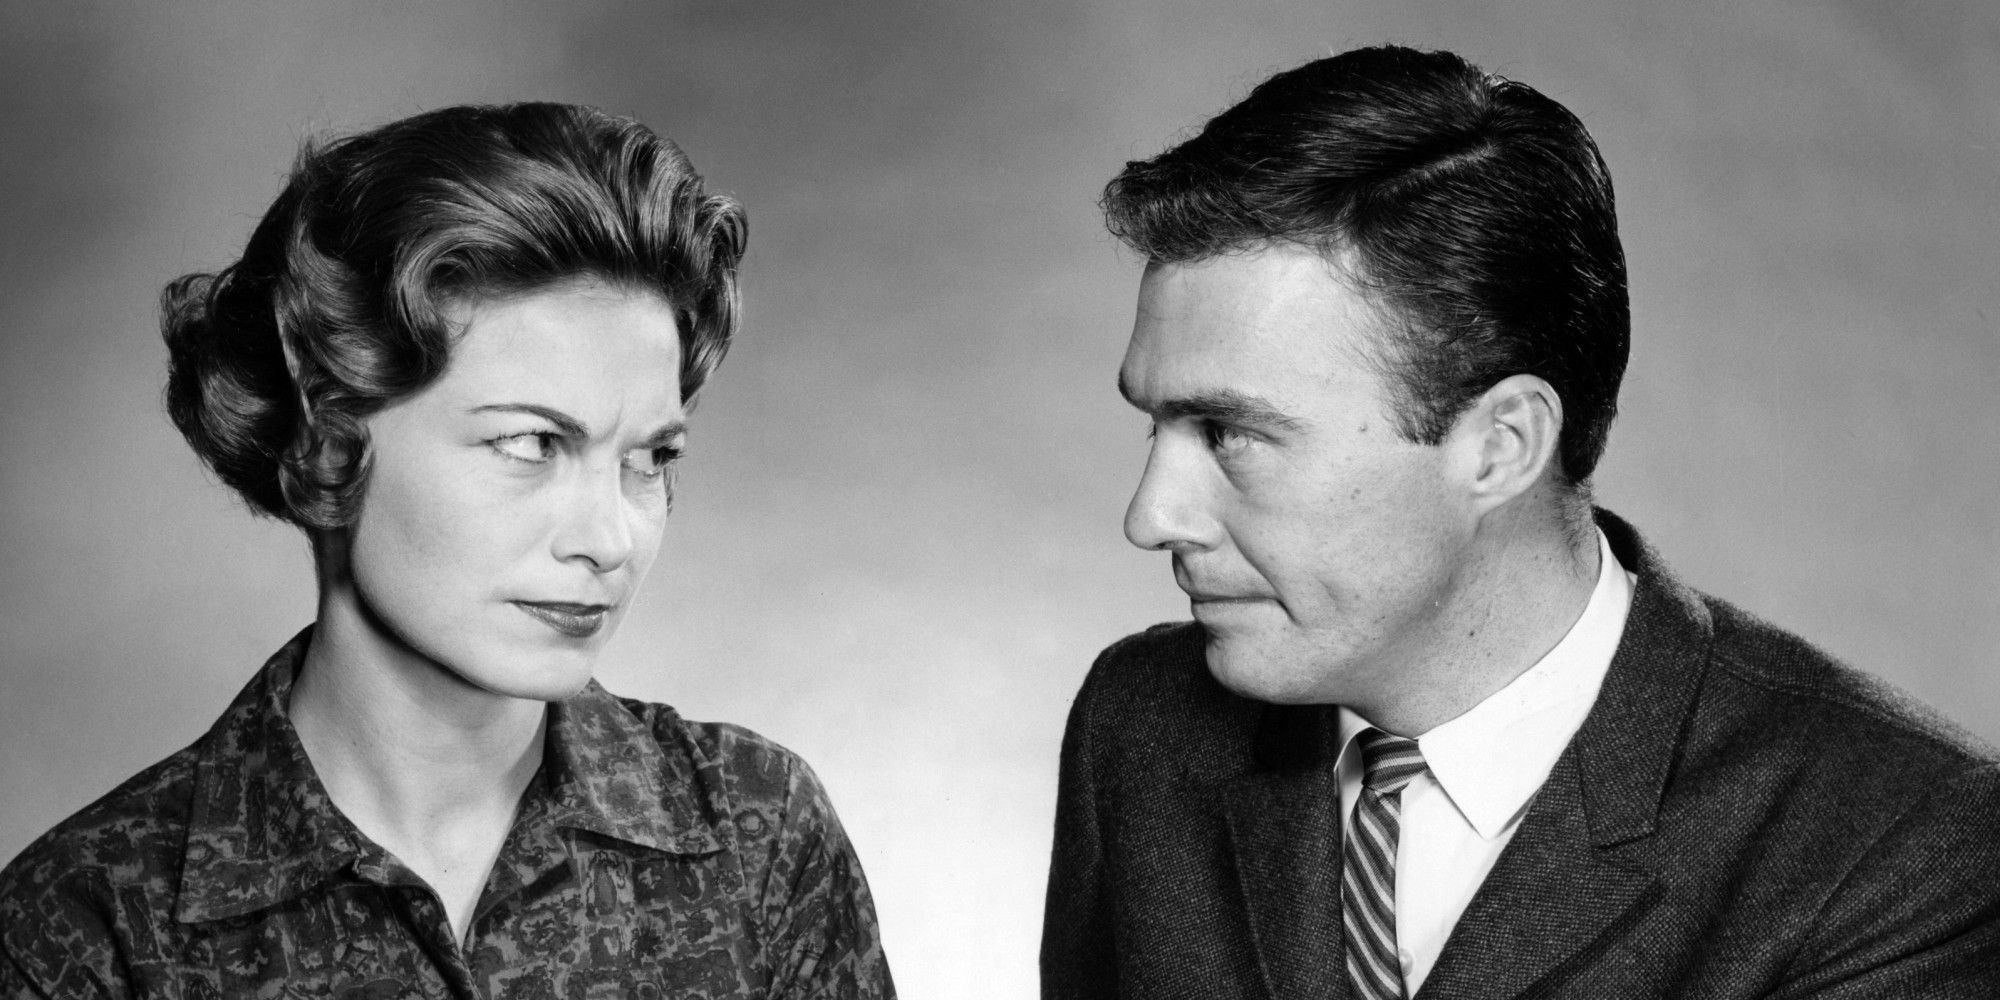 1950's man and woman ile ilgili görsel sonucu